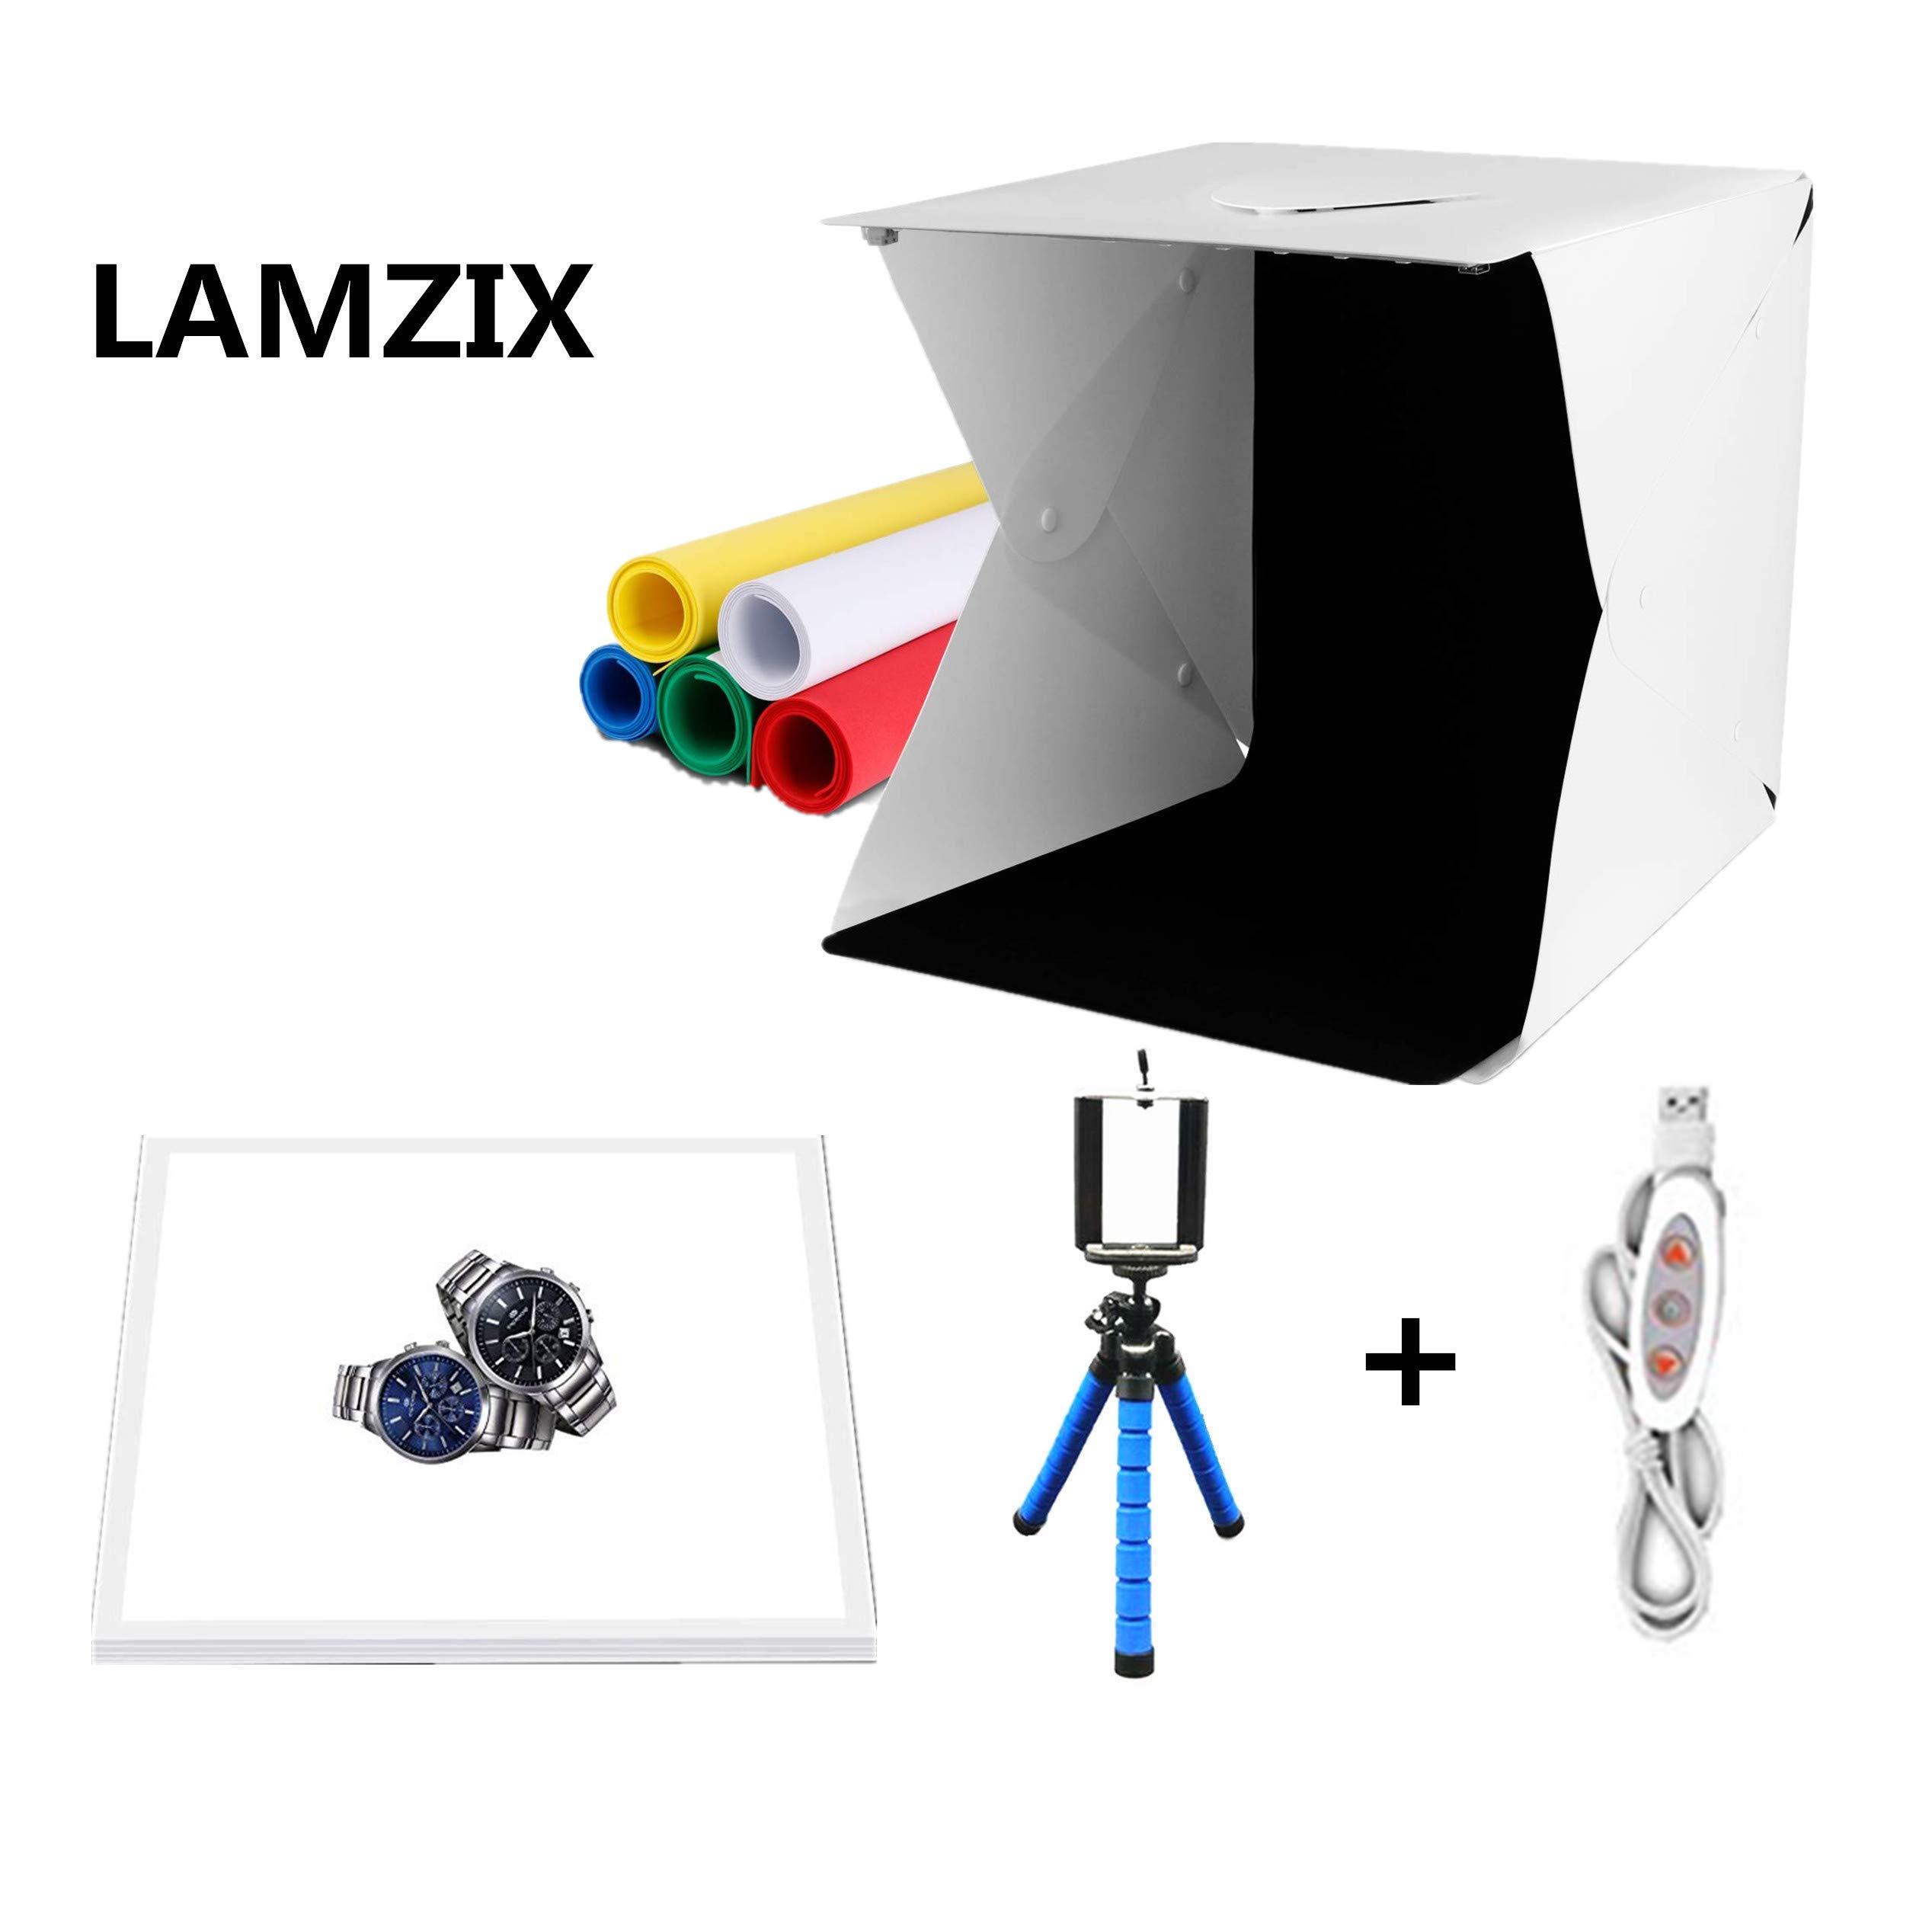 LAMZIX 22x22x23(cm) Mini LED Photography Shadowless Light Lamp Panel Pad and Light Box Kit Studio Shooting Tent Box with Dual Adjustable LED Light and 6 Background kit